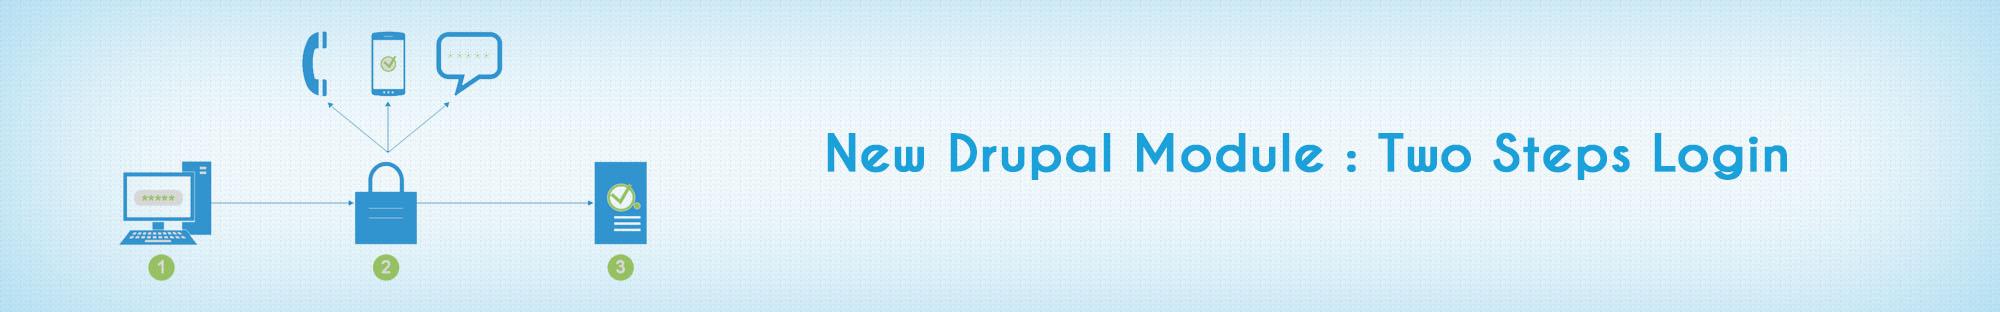 New drupal module contributed by Kellton Tech